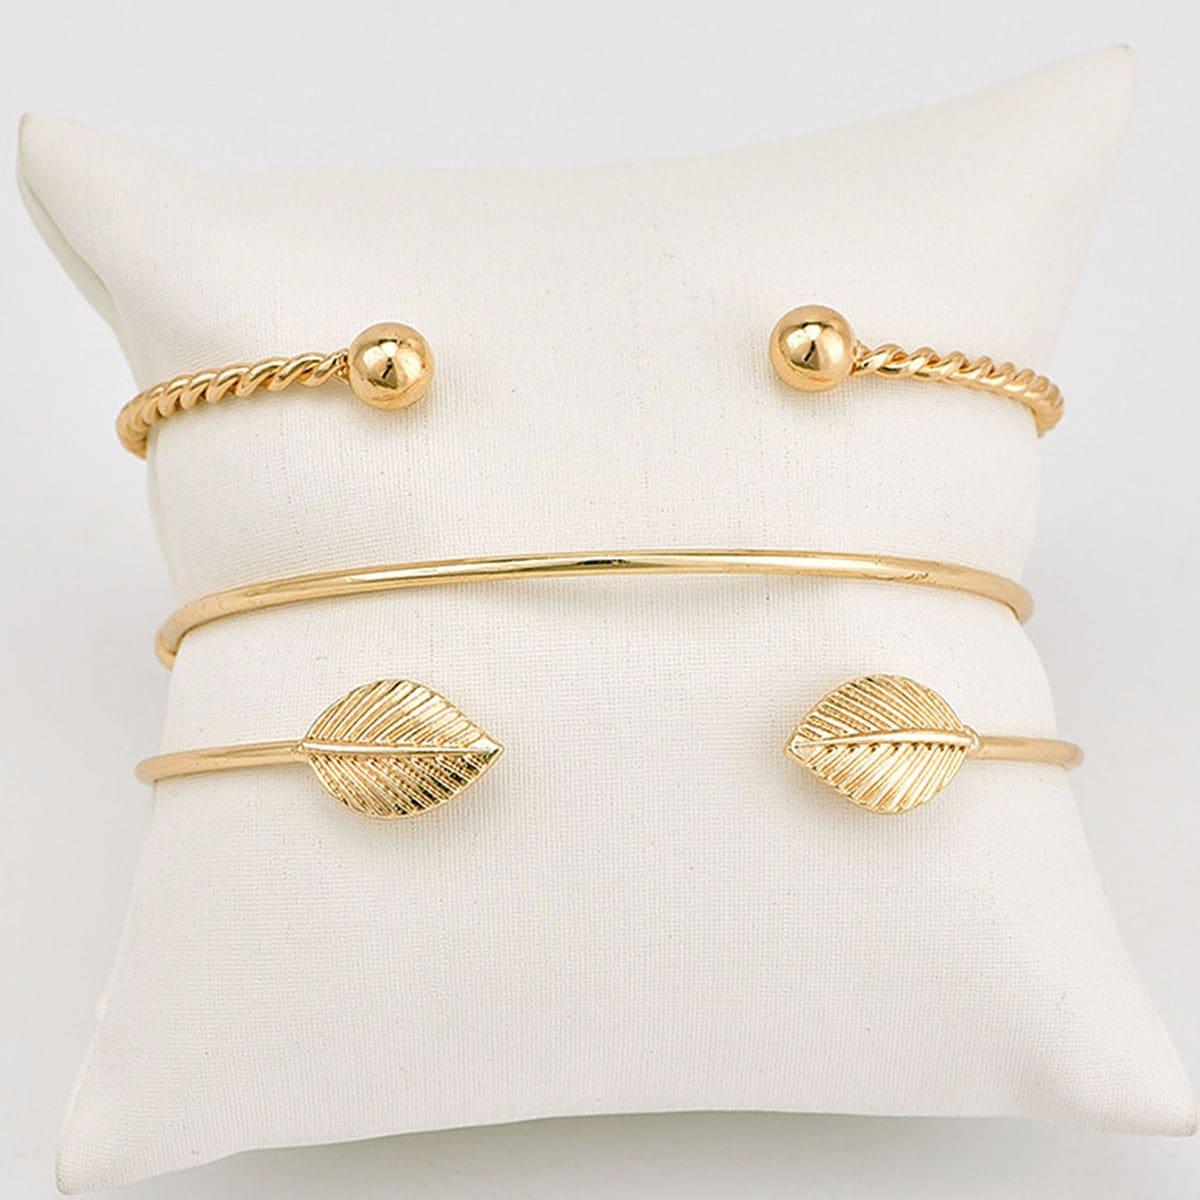 Streifen & Blatt Detail Manschette Armband Set 3pcs